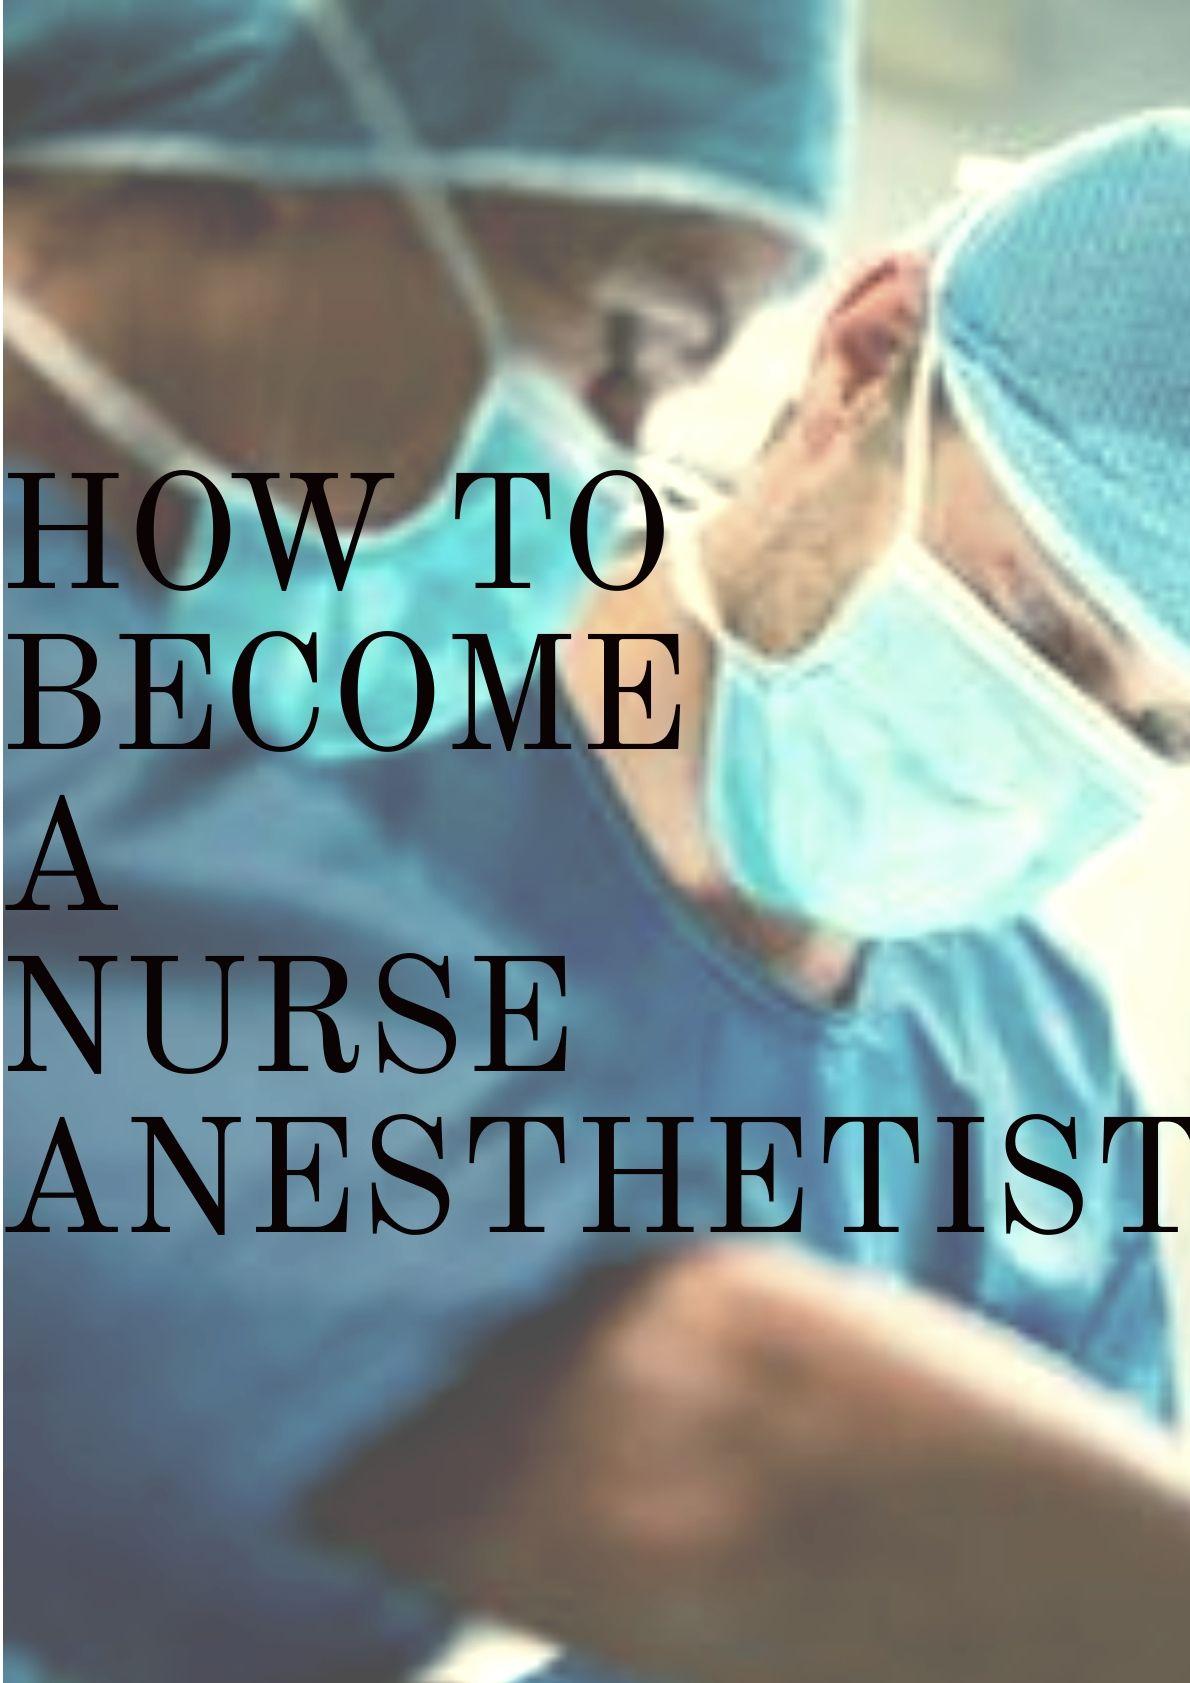 How to a nurse anesthetist nurse anesthetist